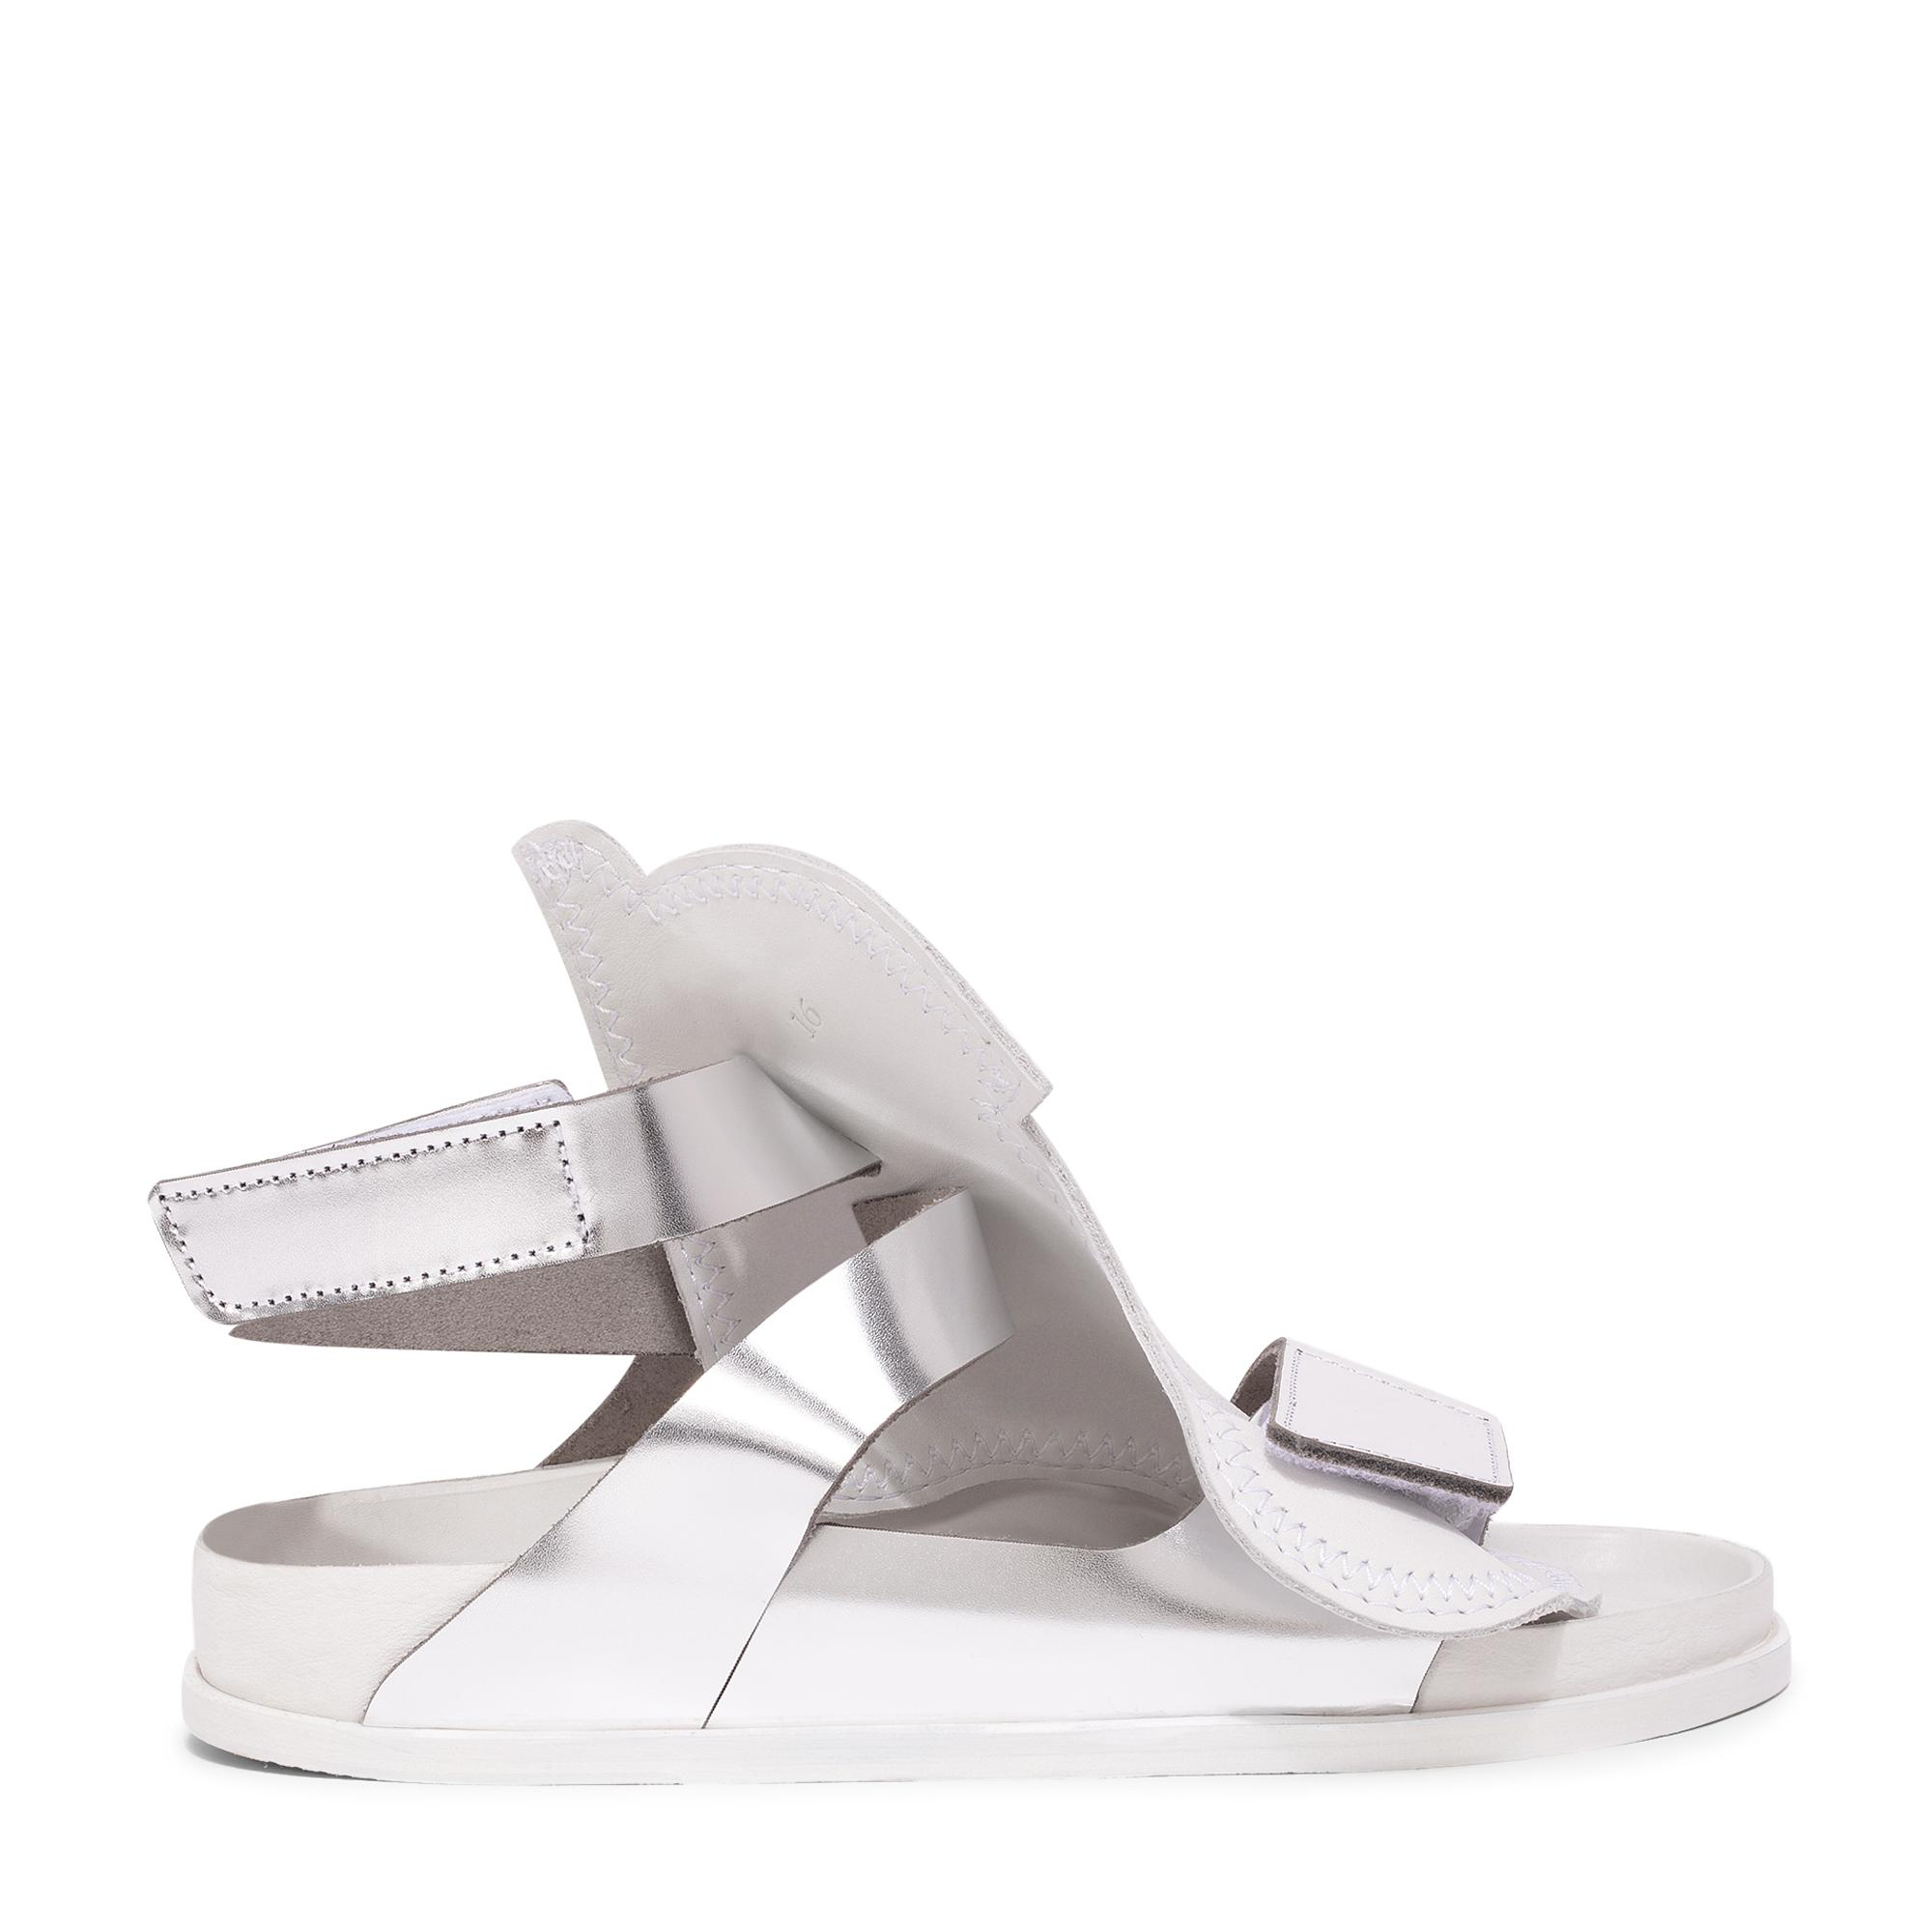 x CSM Bukarest sandals